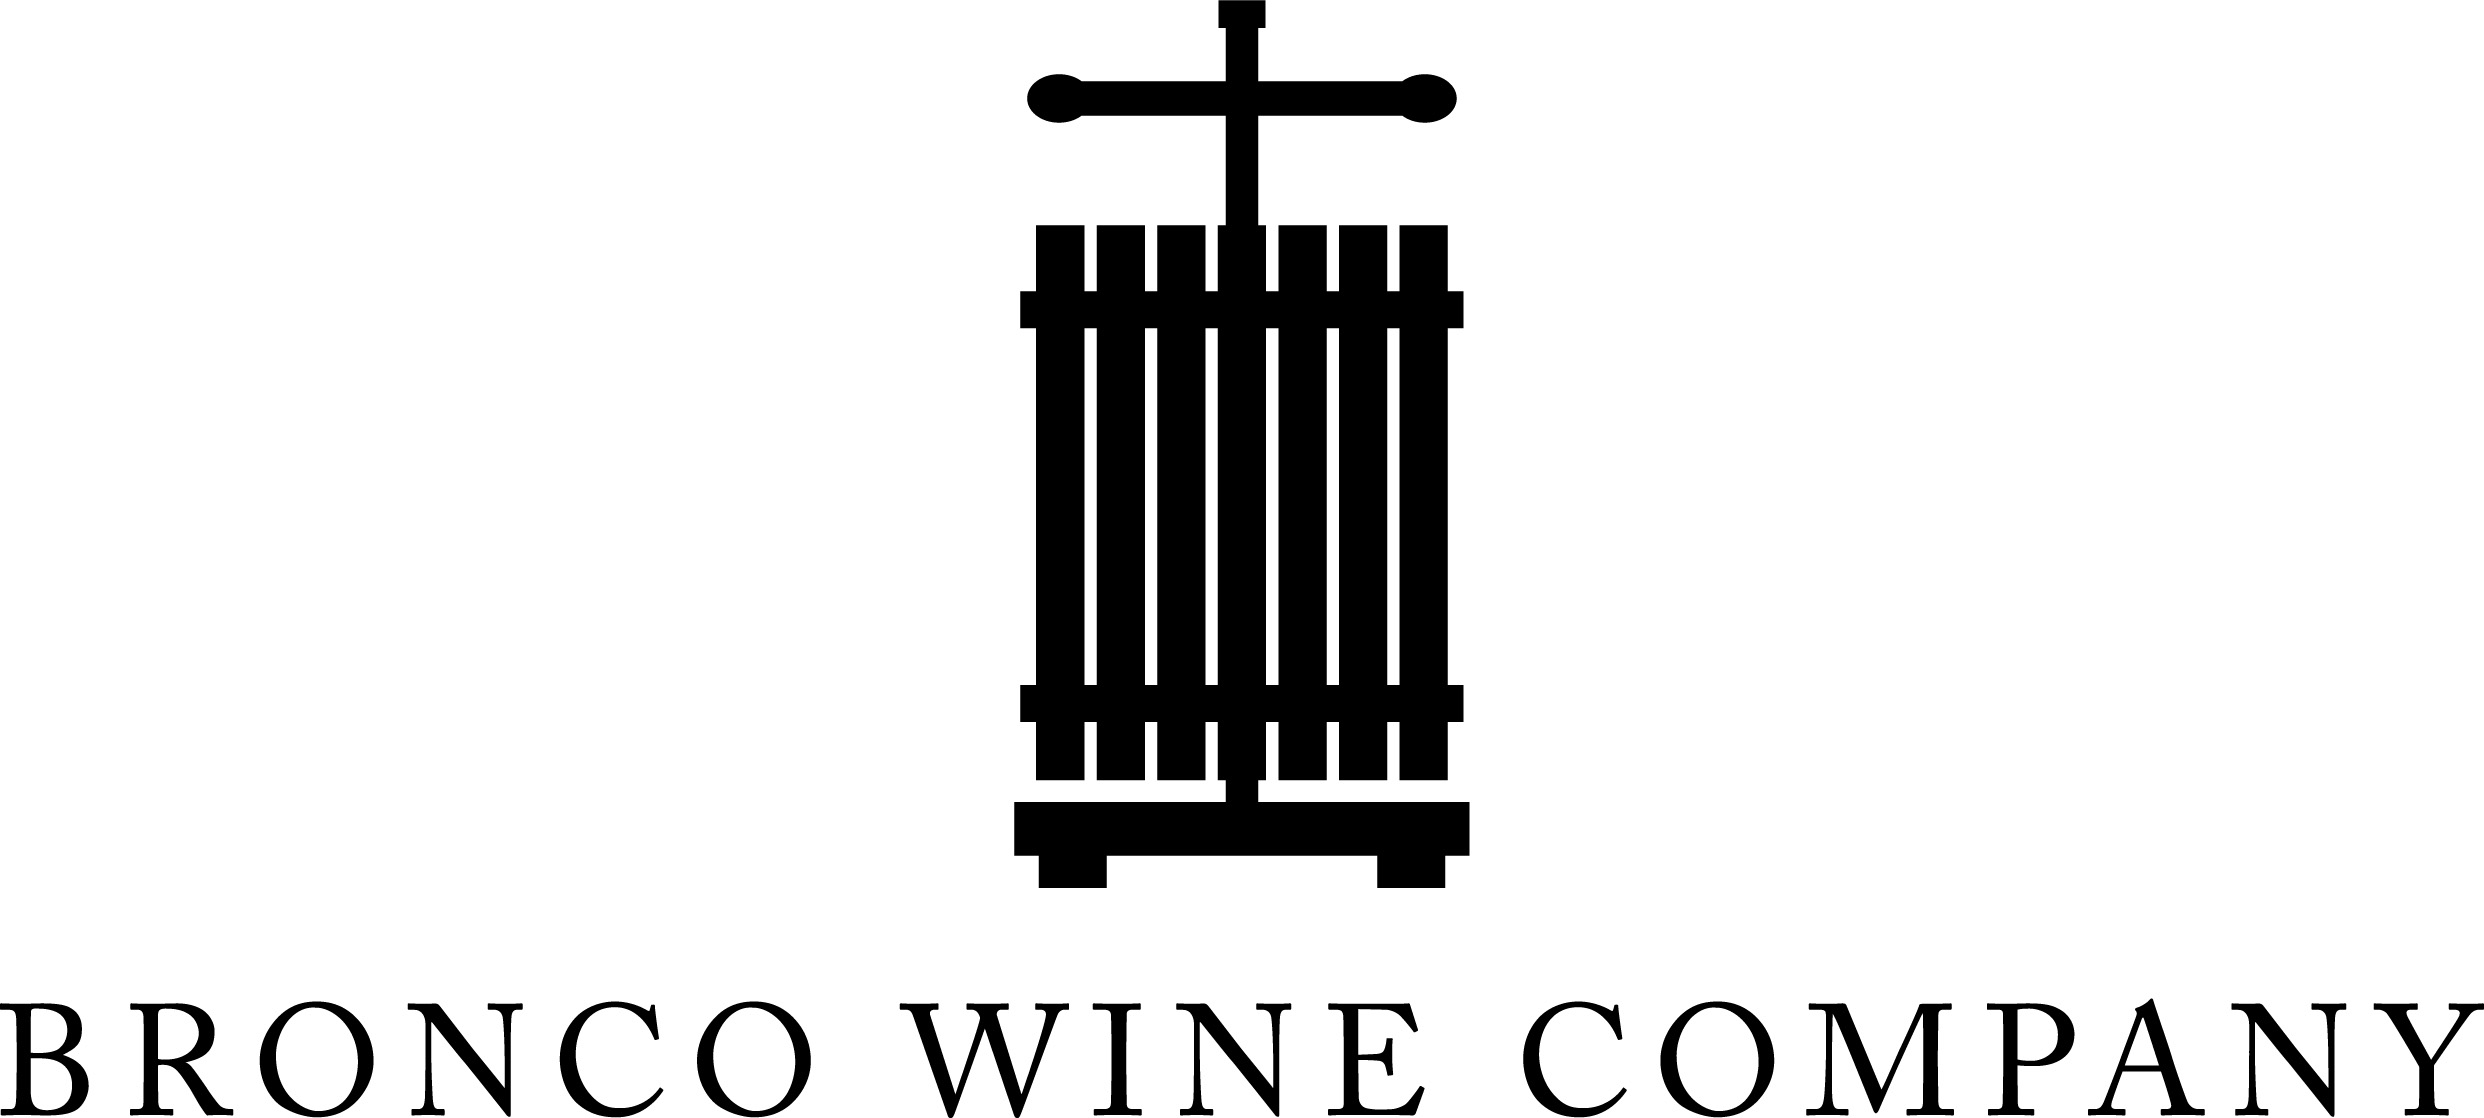 bronco wines logo.jpg